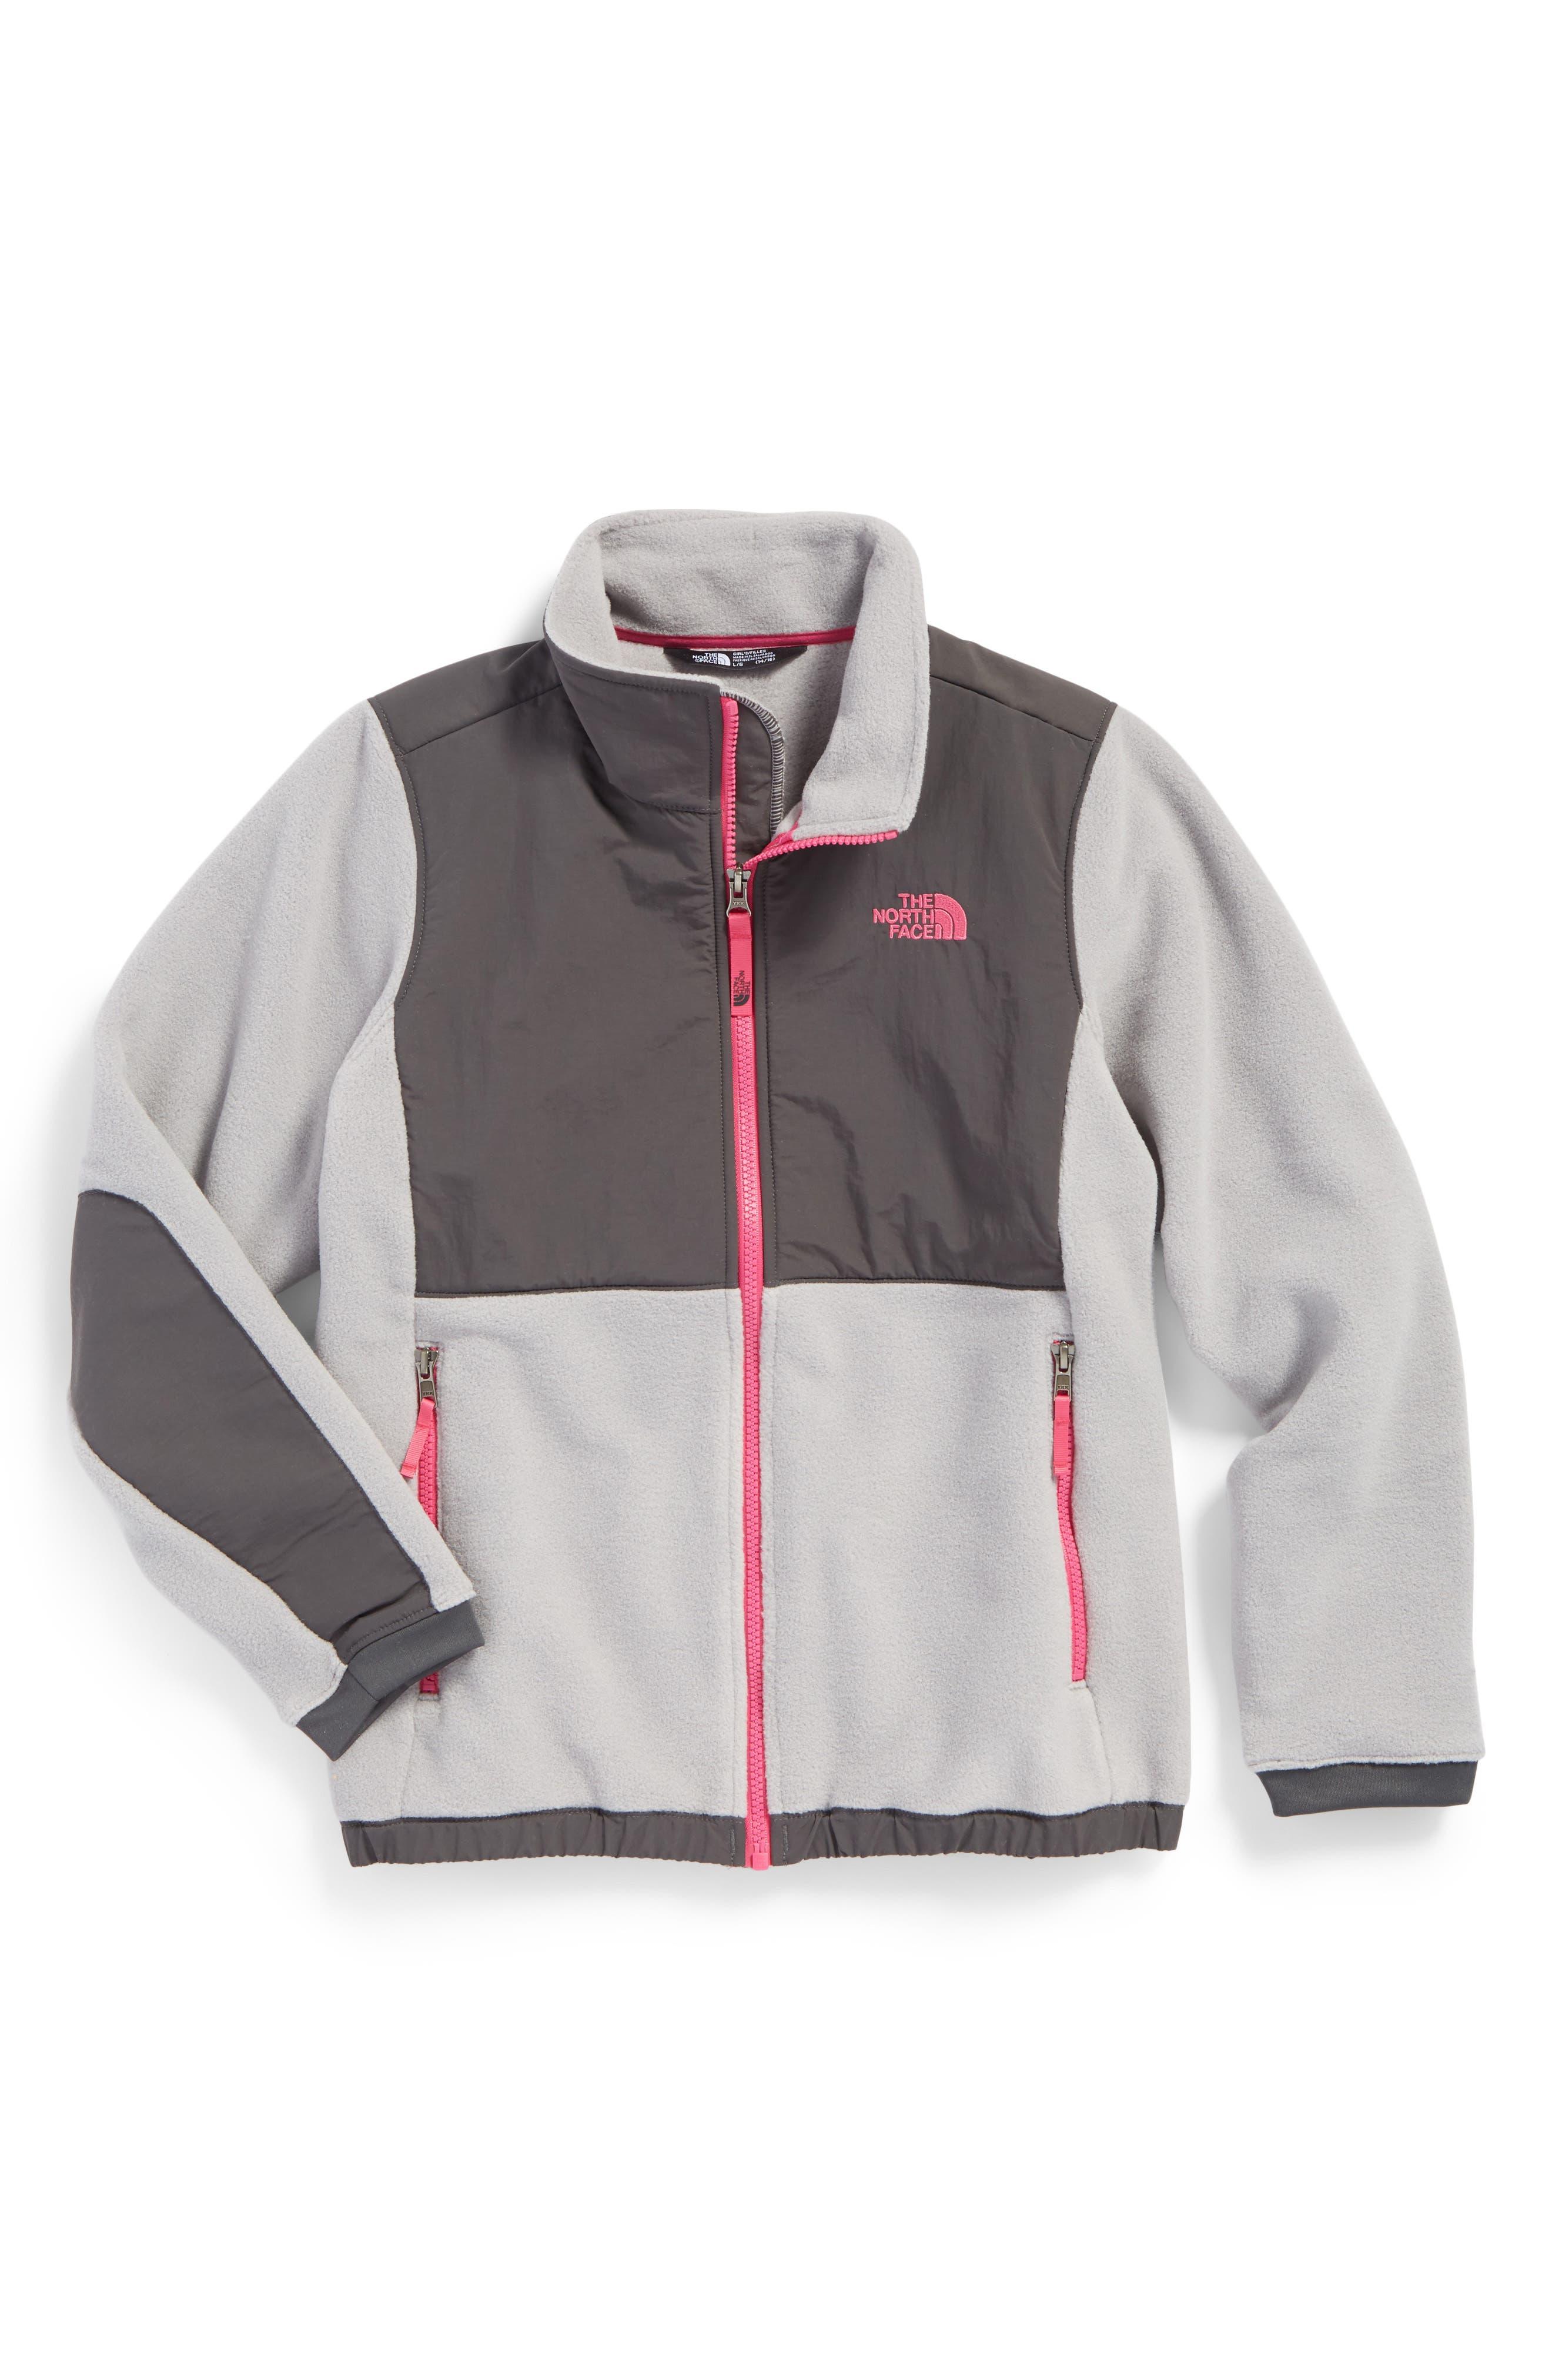 Denali Recycled Fleece Jacket,                         Main,                         color, 021